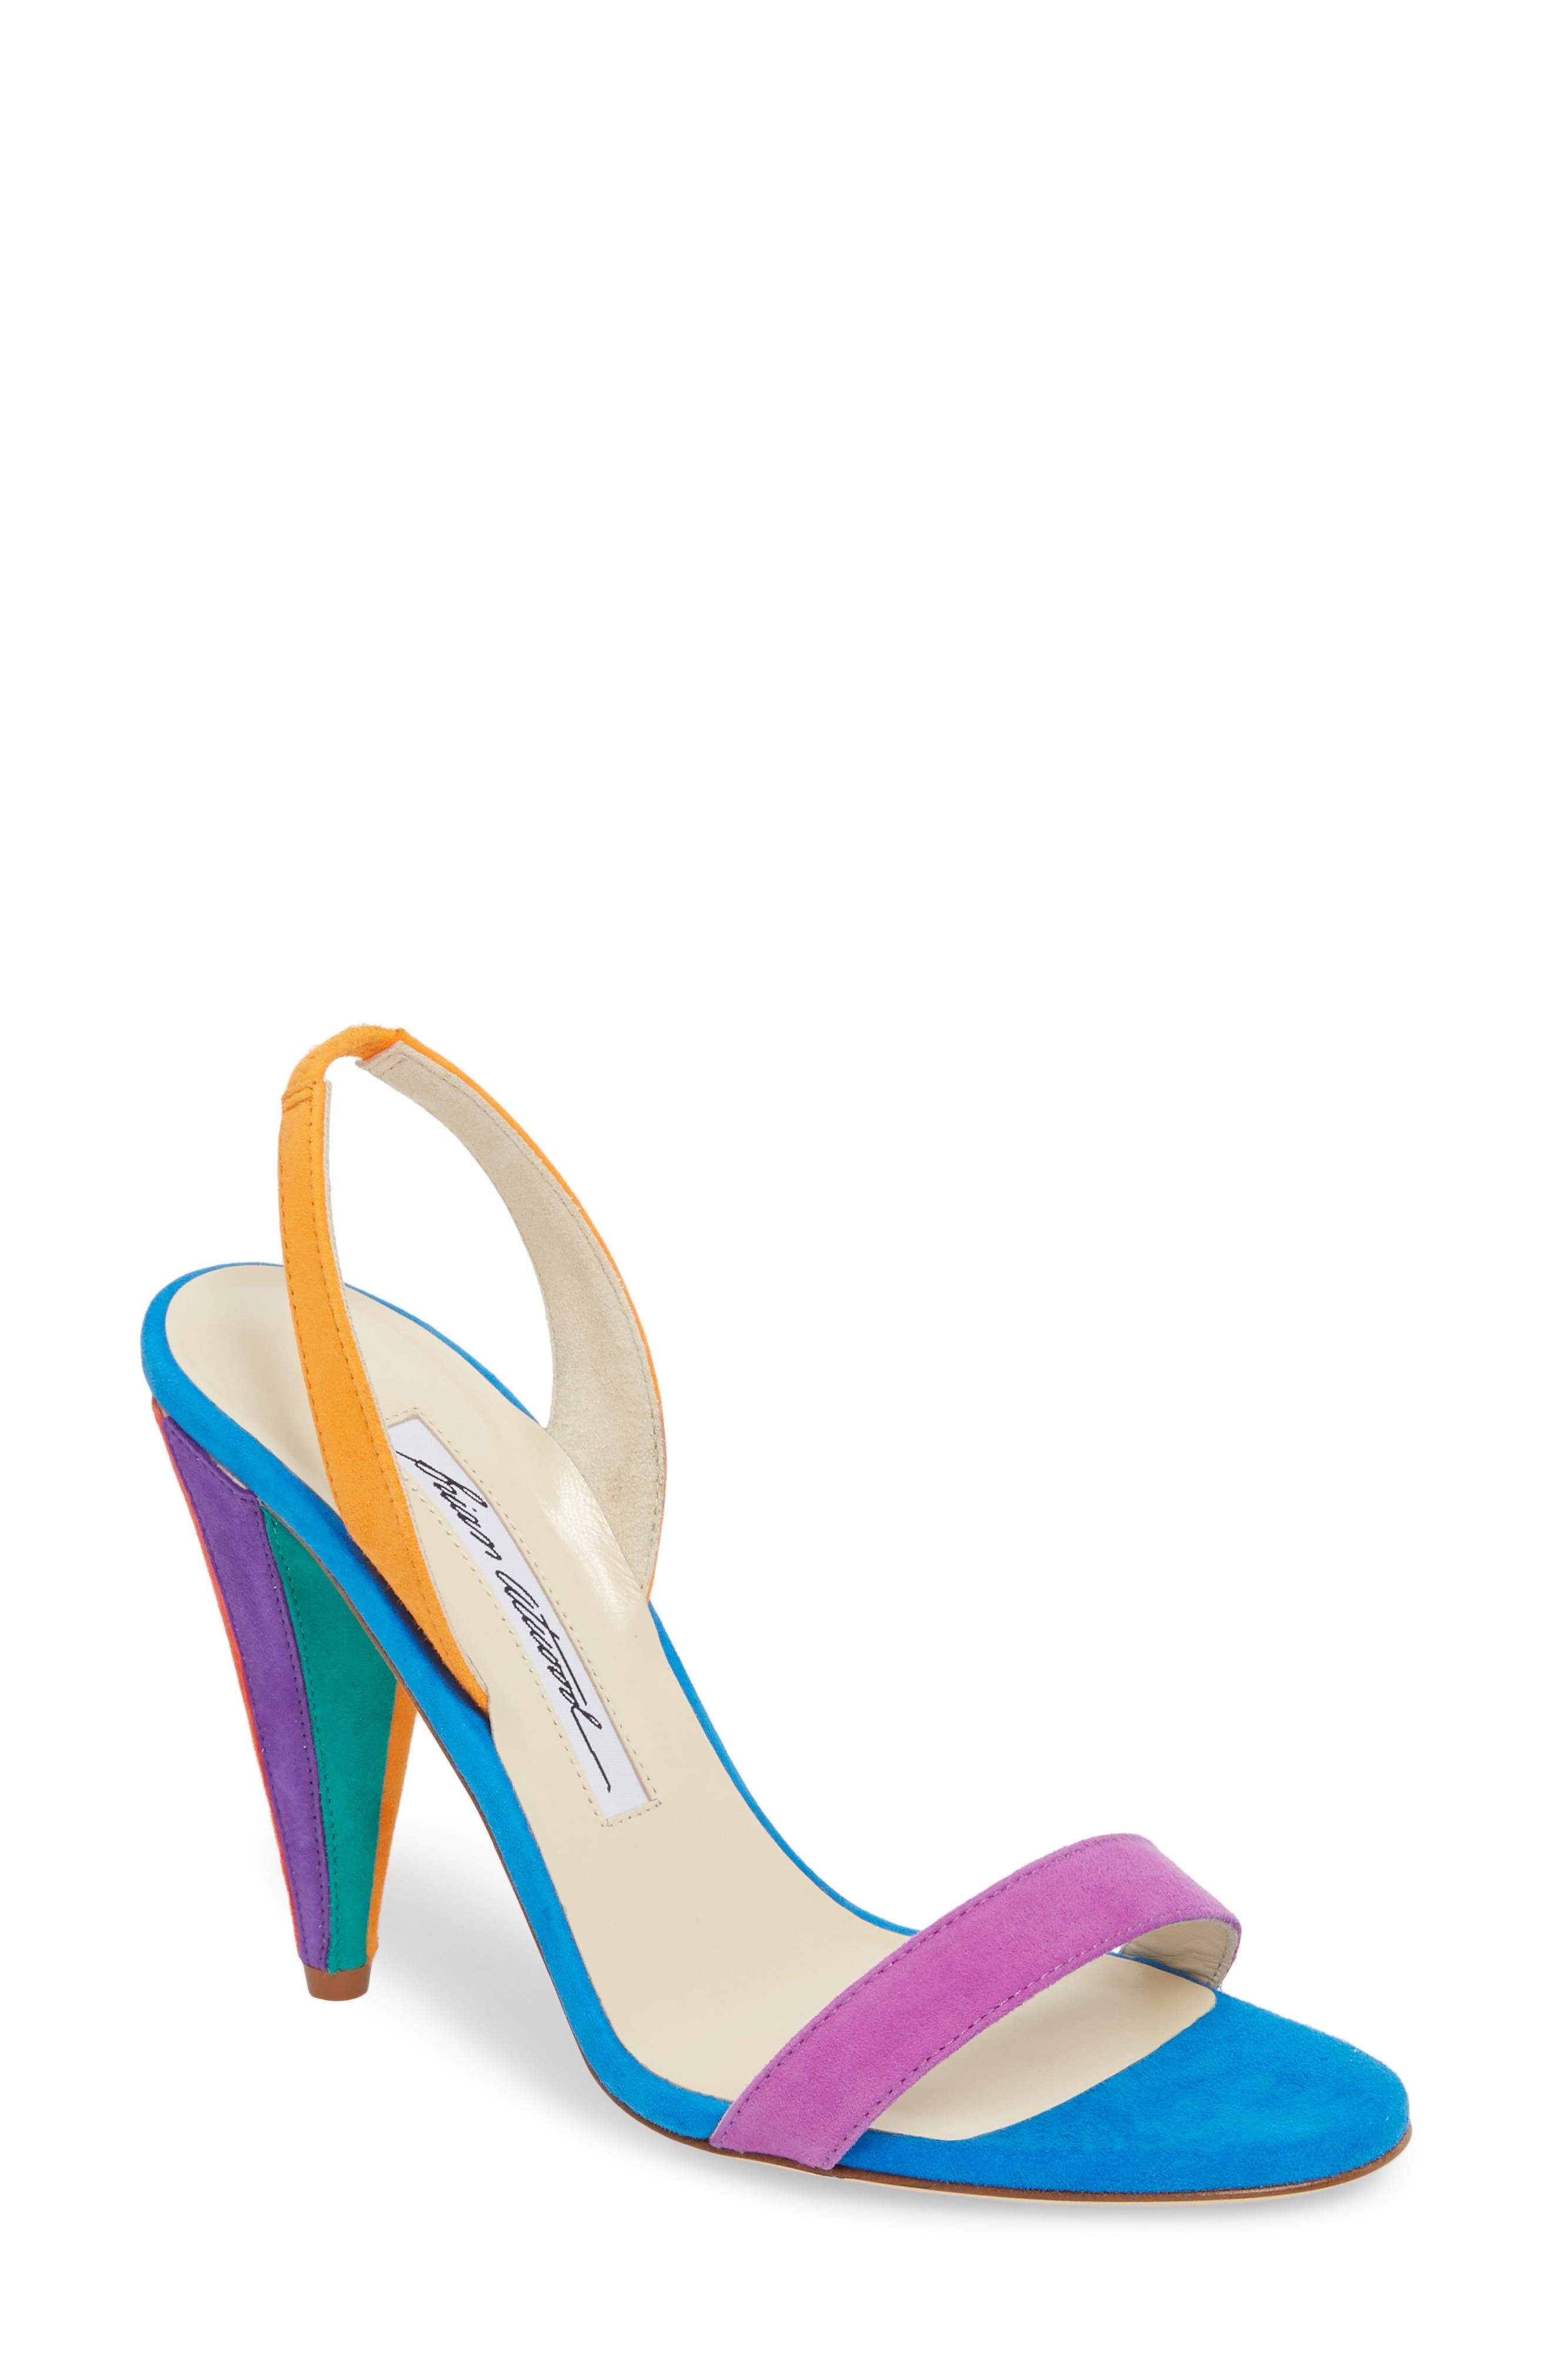 Susii Cone Heel Sandal,                             Main thumbnail 1, color,                             400